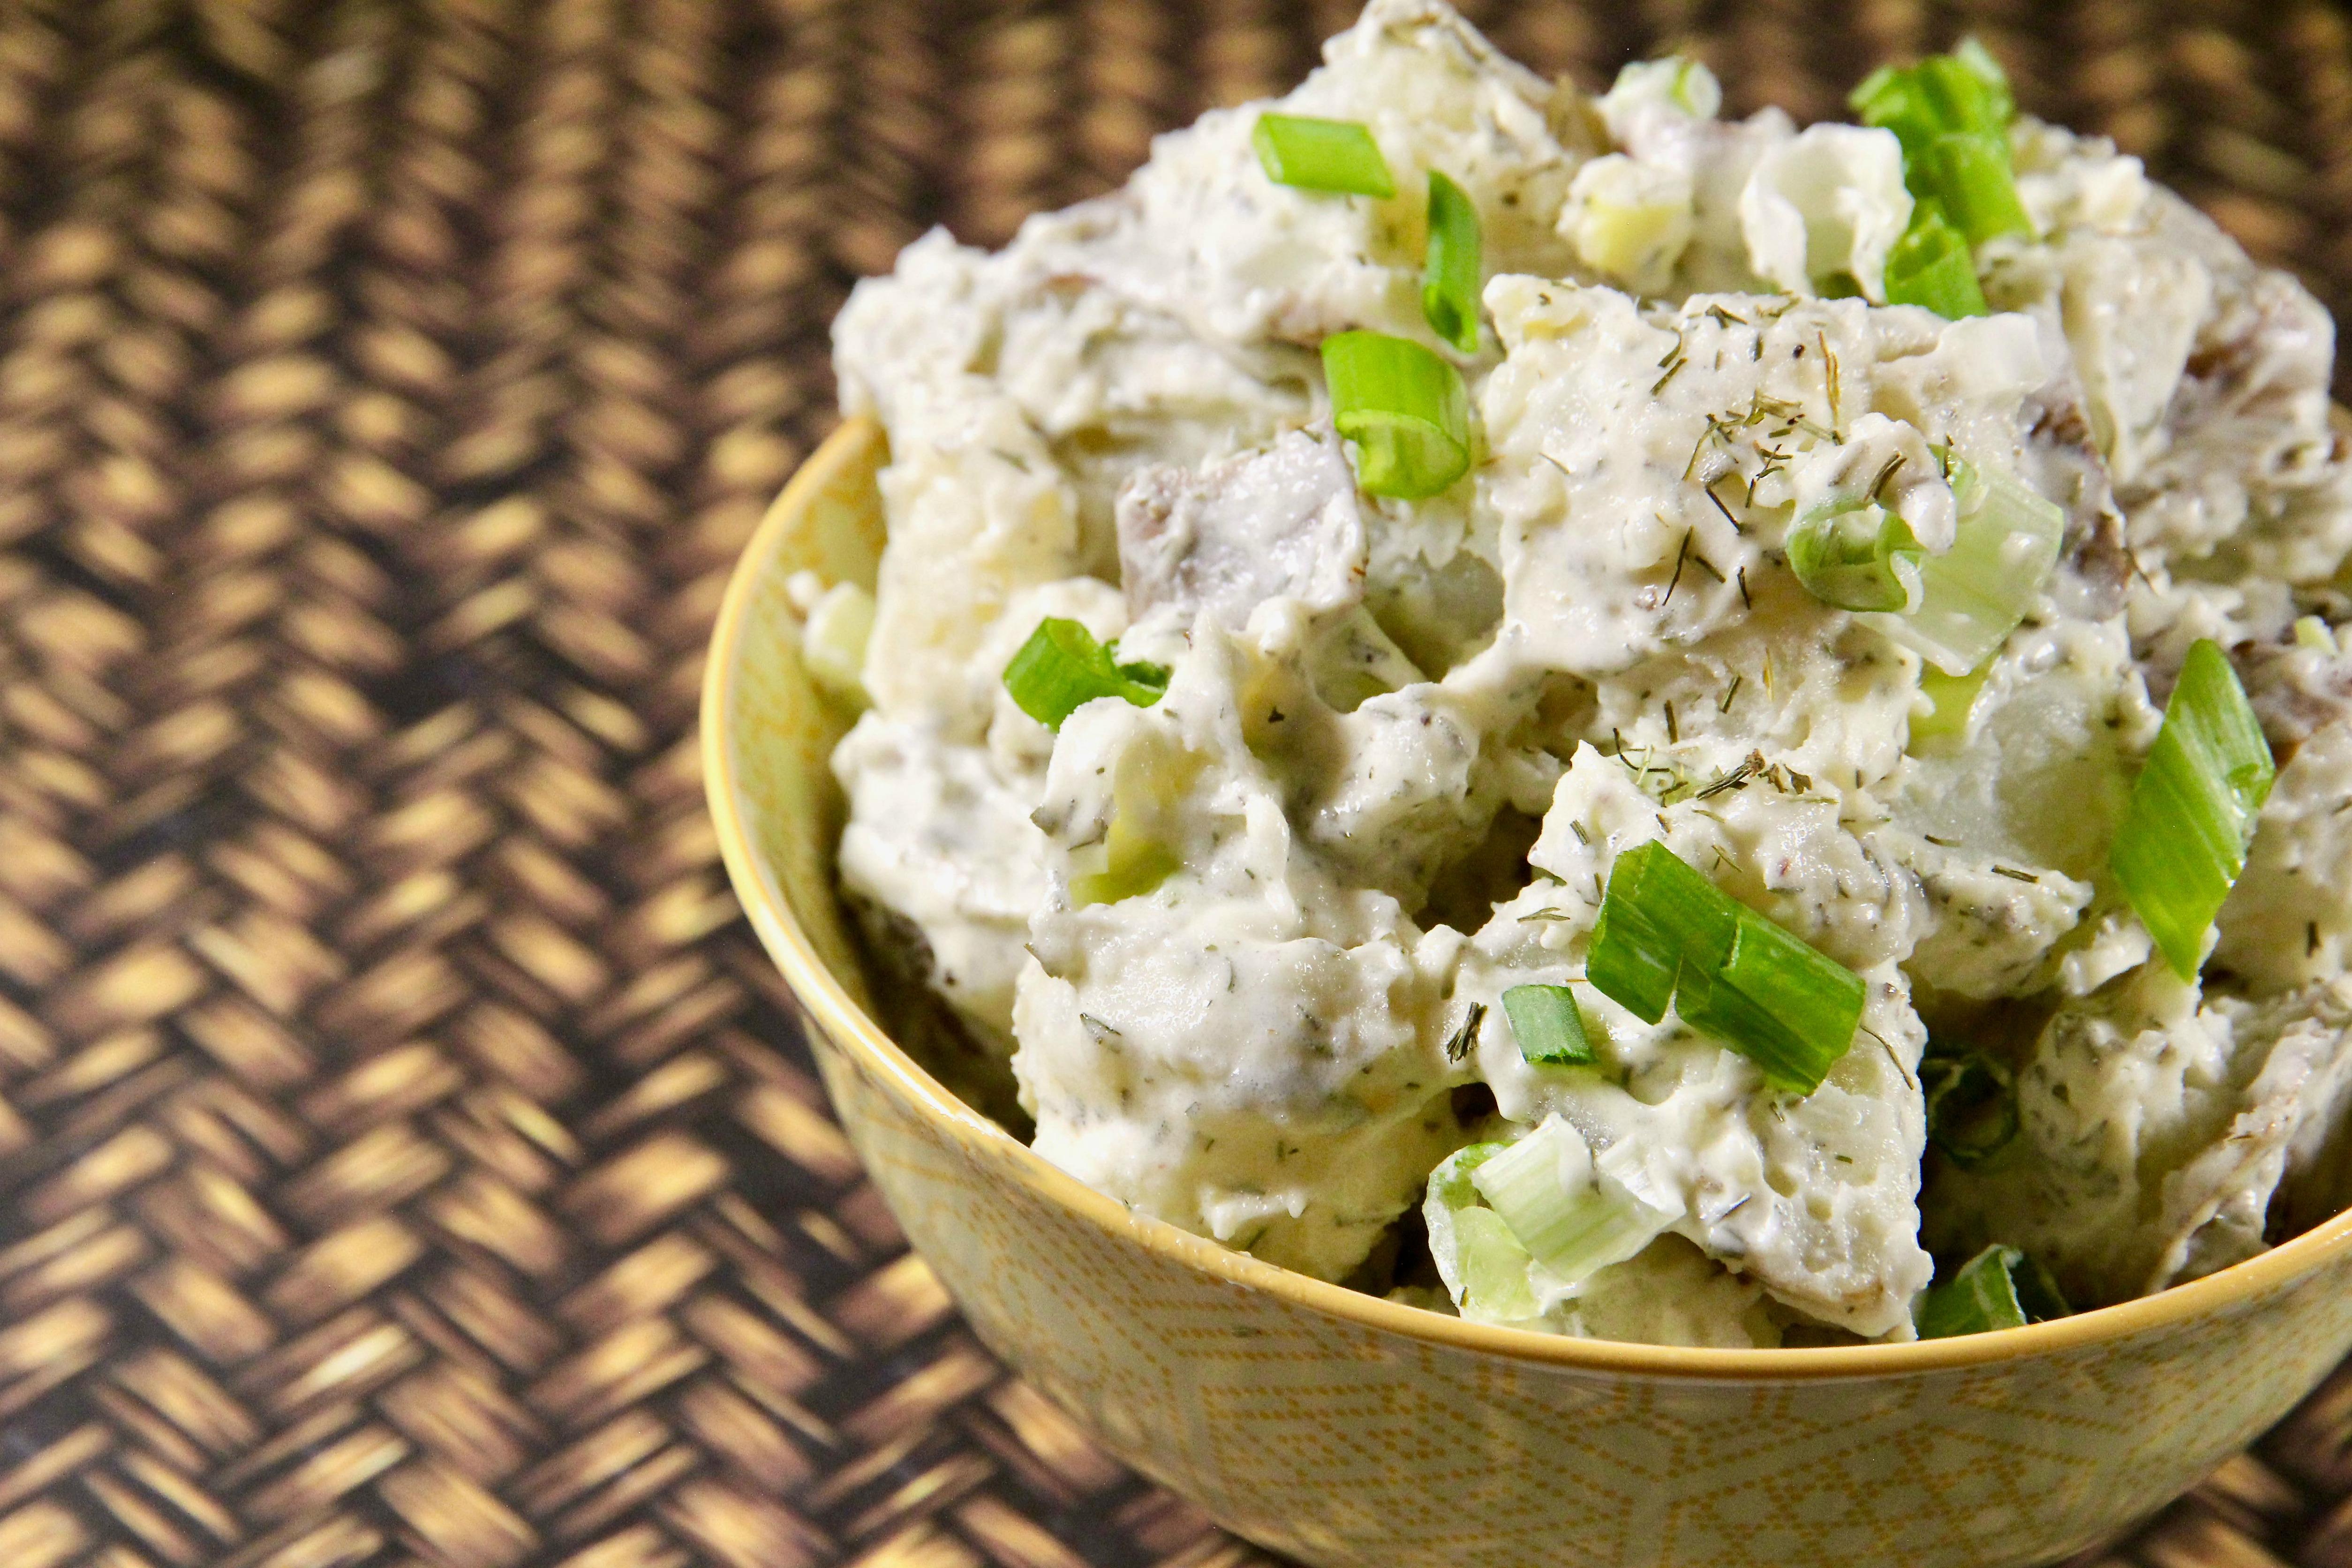 Mom's Dill Potato Salad